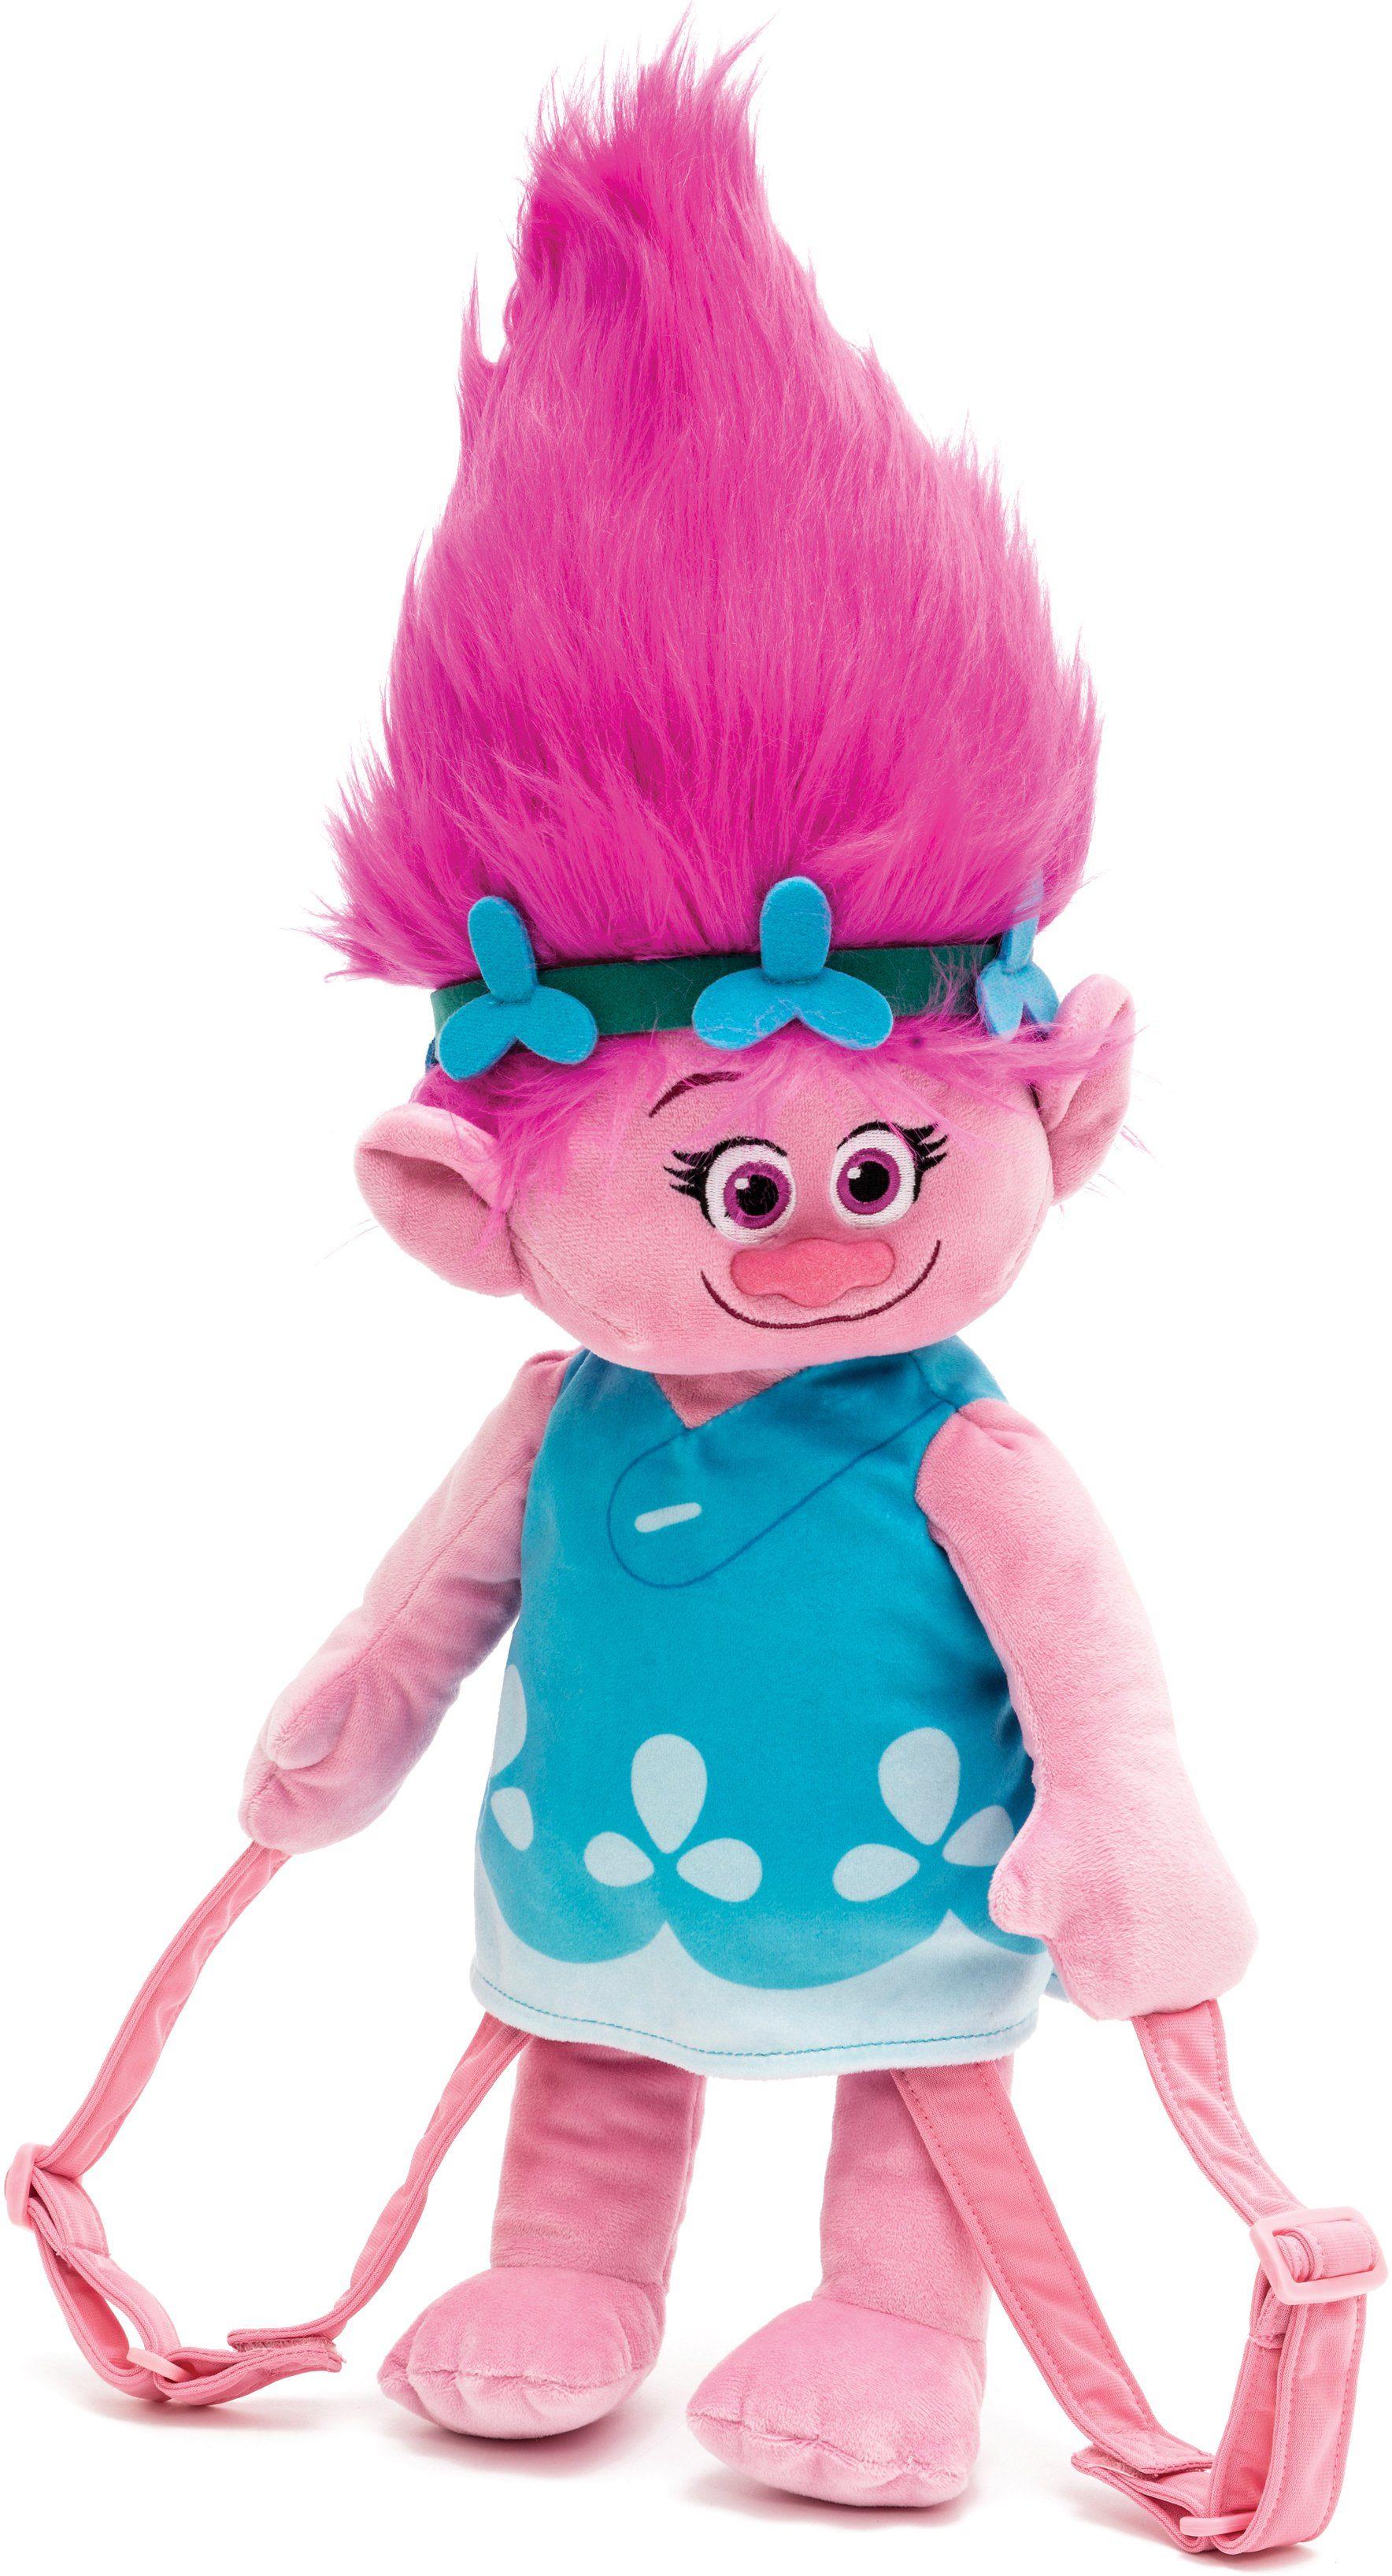 JOY TOY DreamWorks Trolls Poppy Plüschrucksack, 54 cm